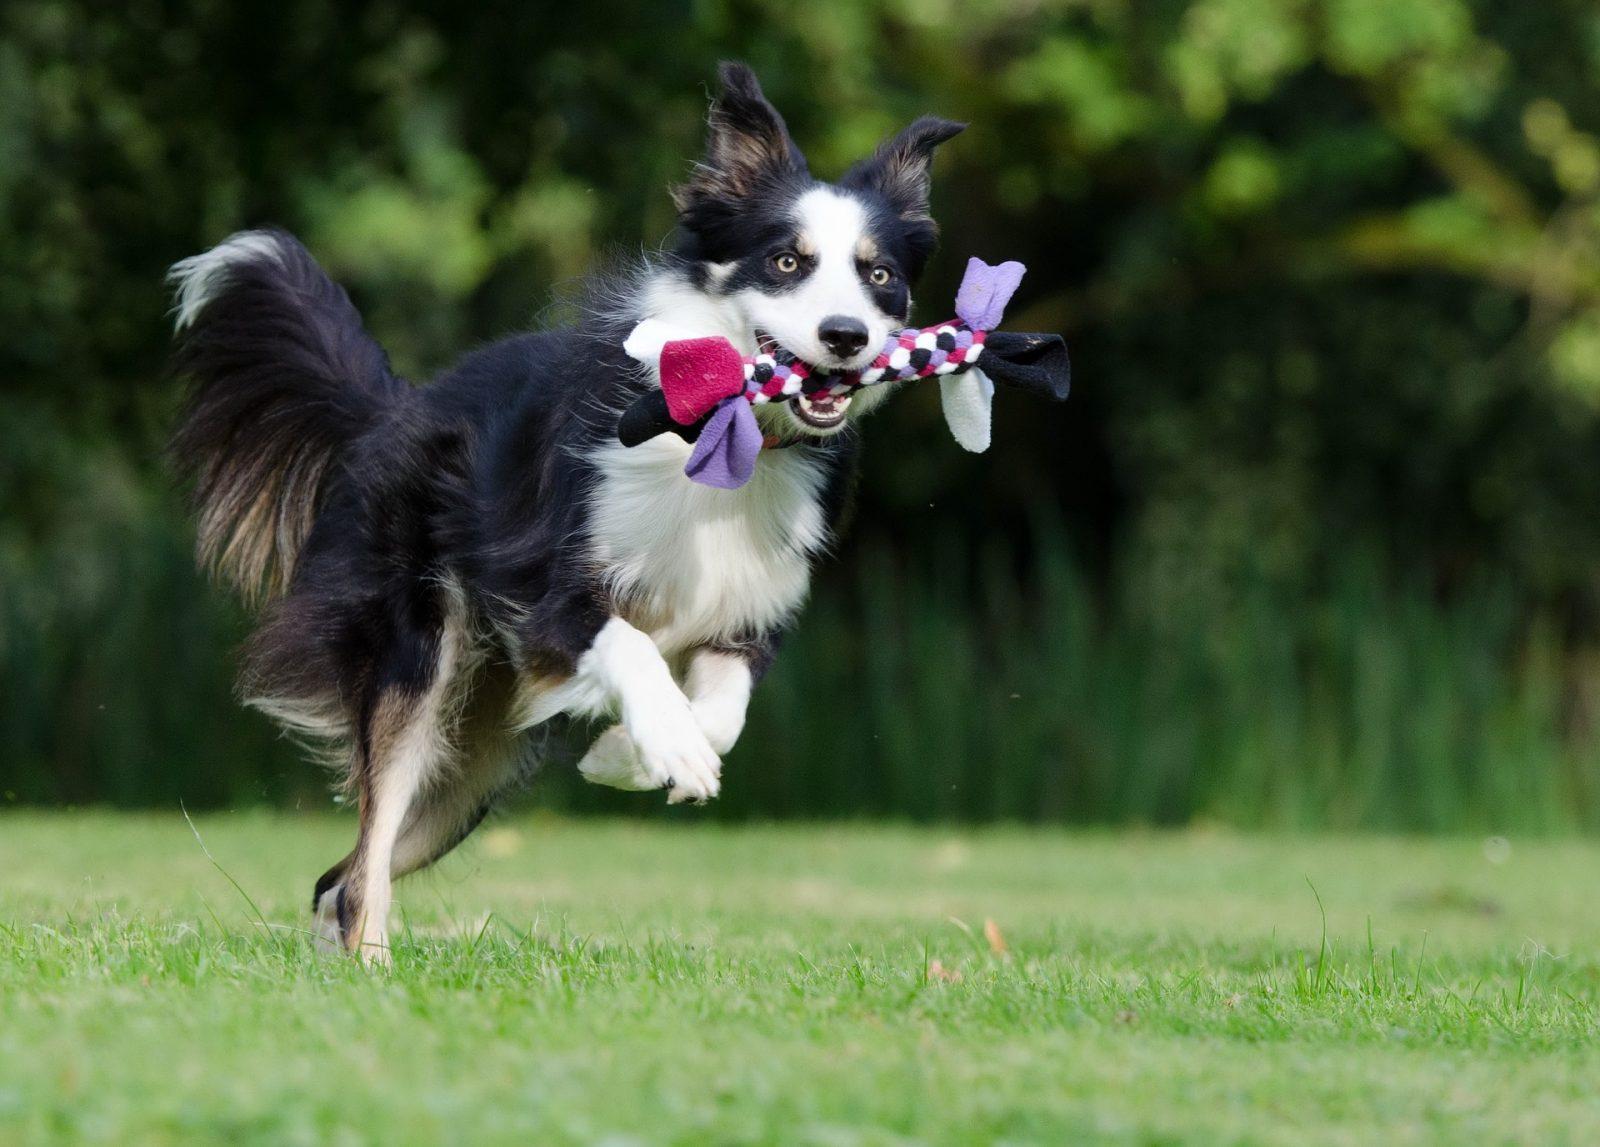 jouet pour chien hyperactif